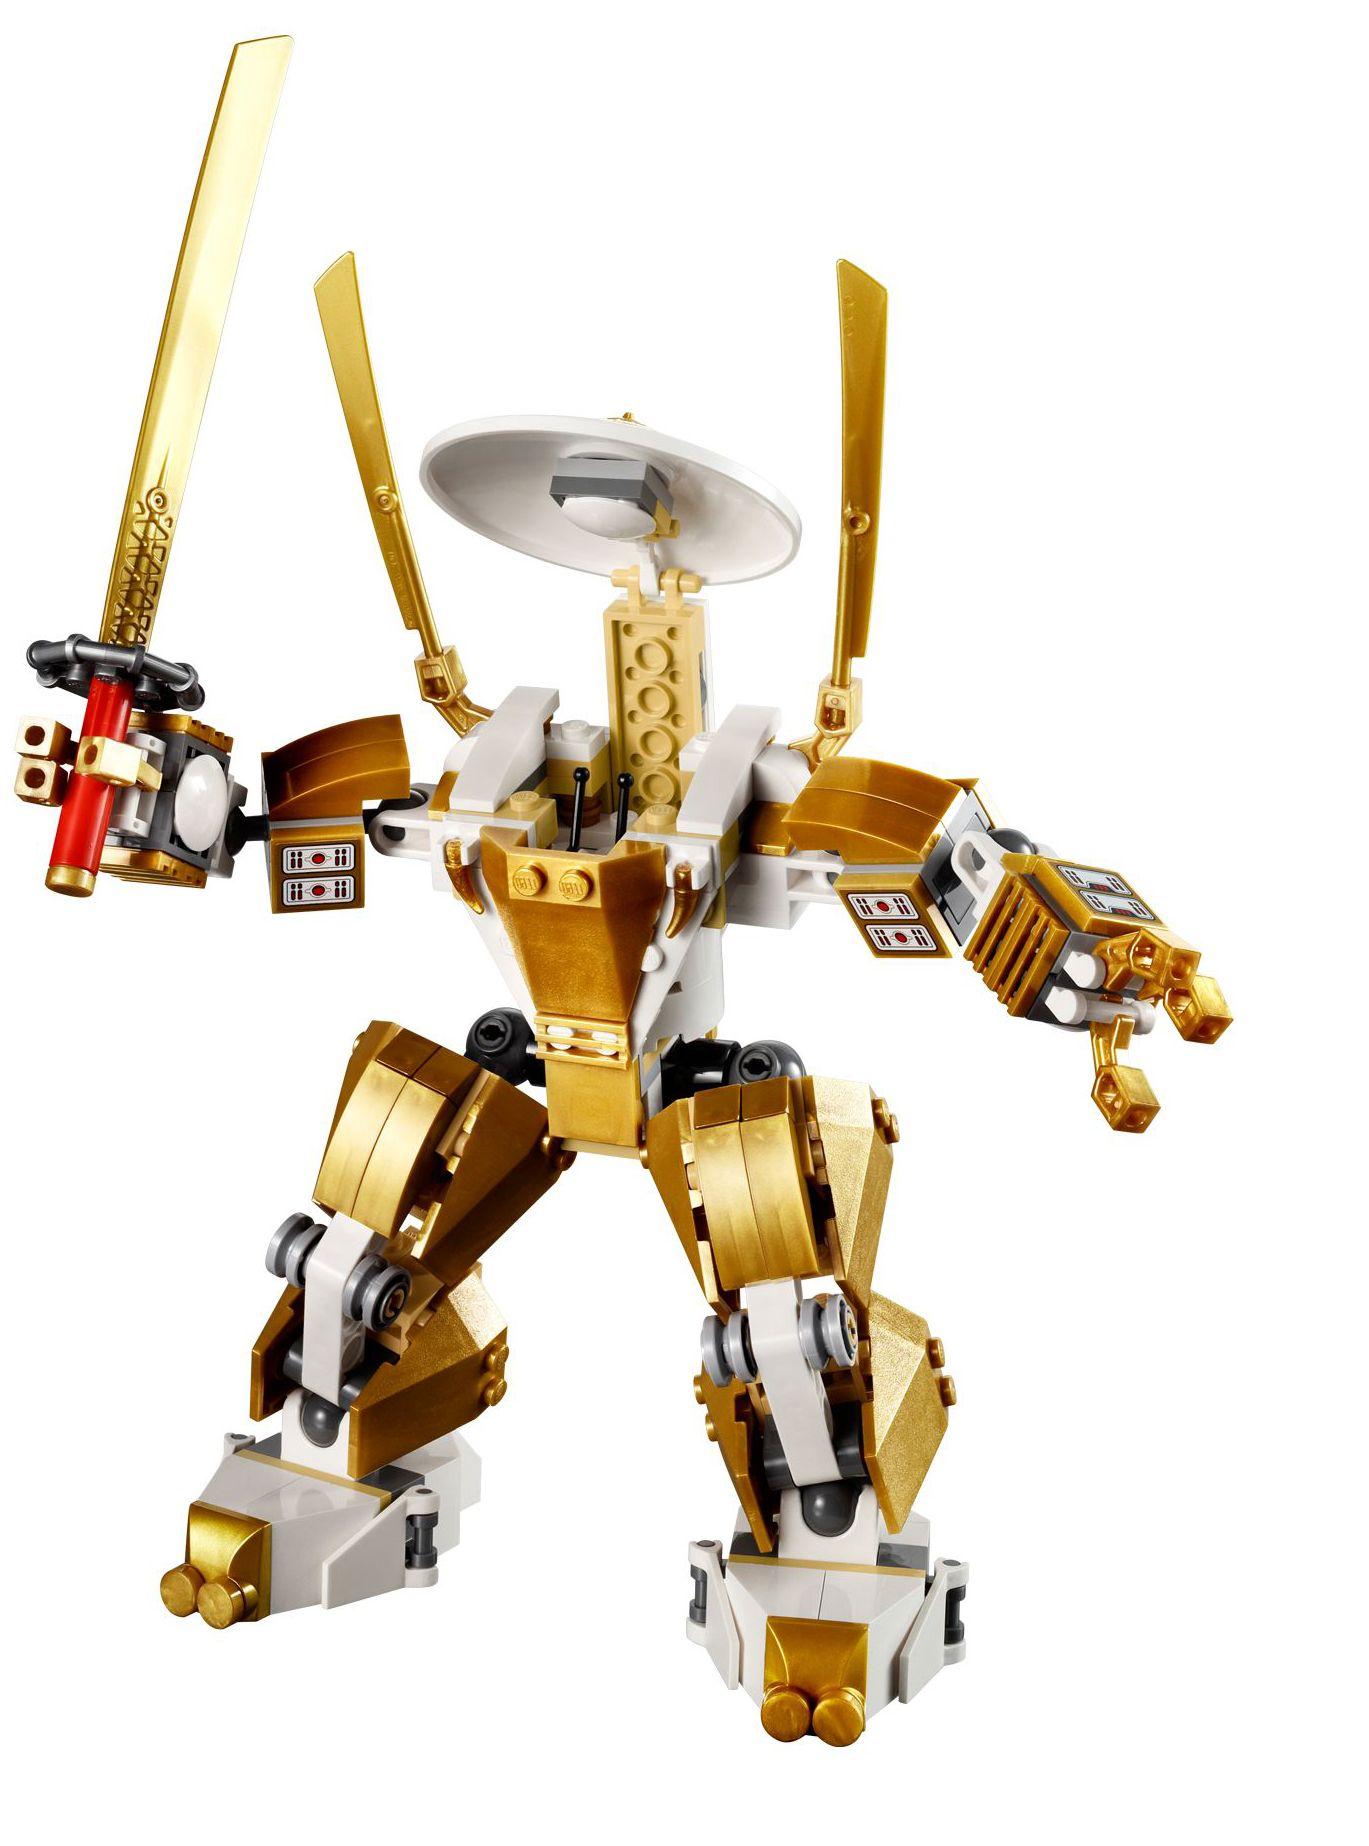 Worksheet. Lego 70505  Temple of Light  i Brick City